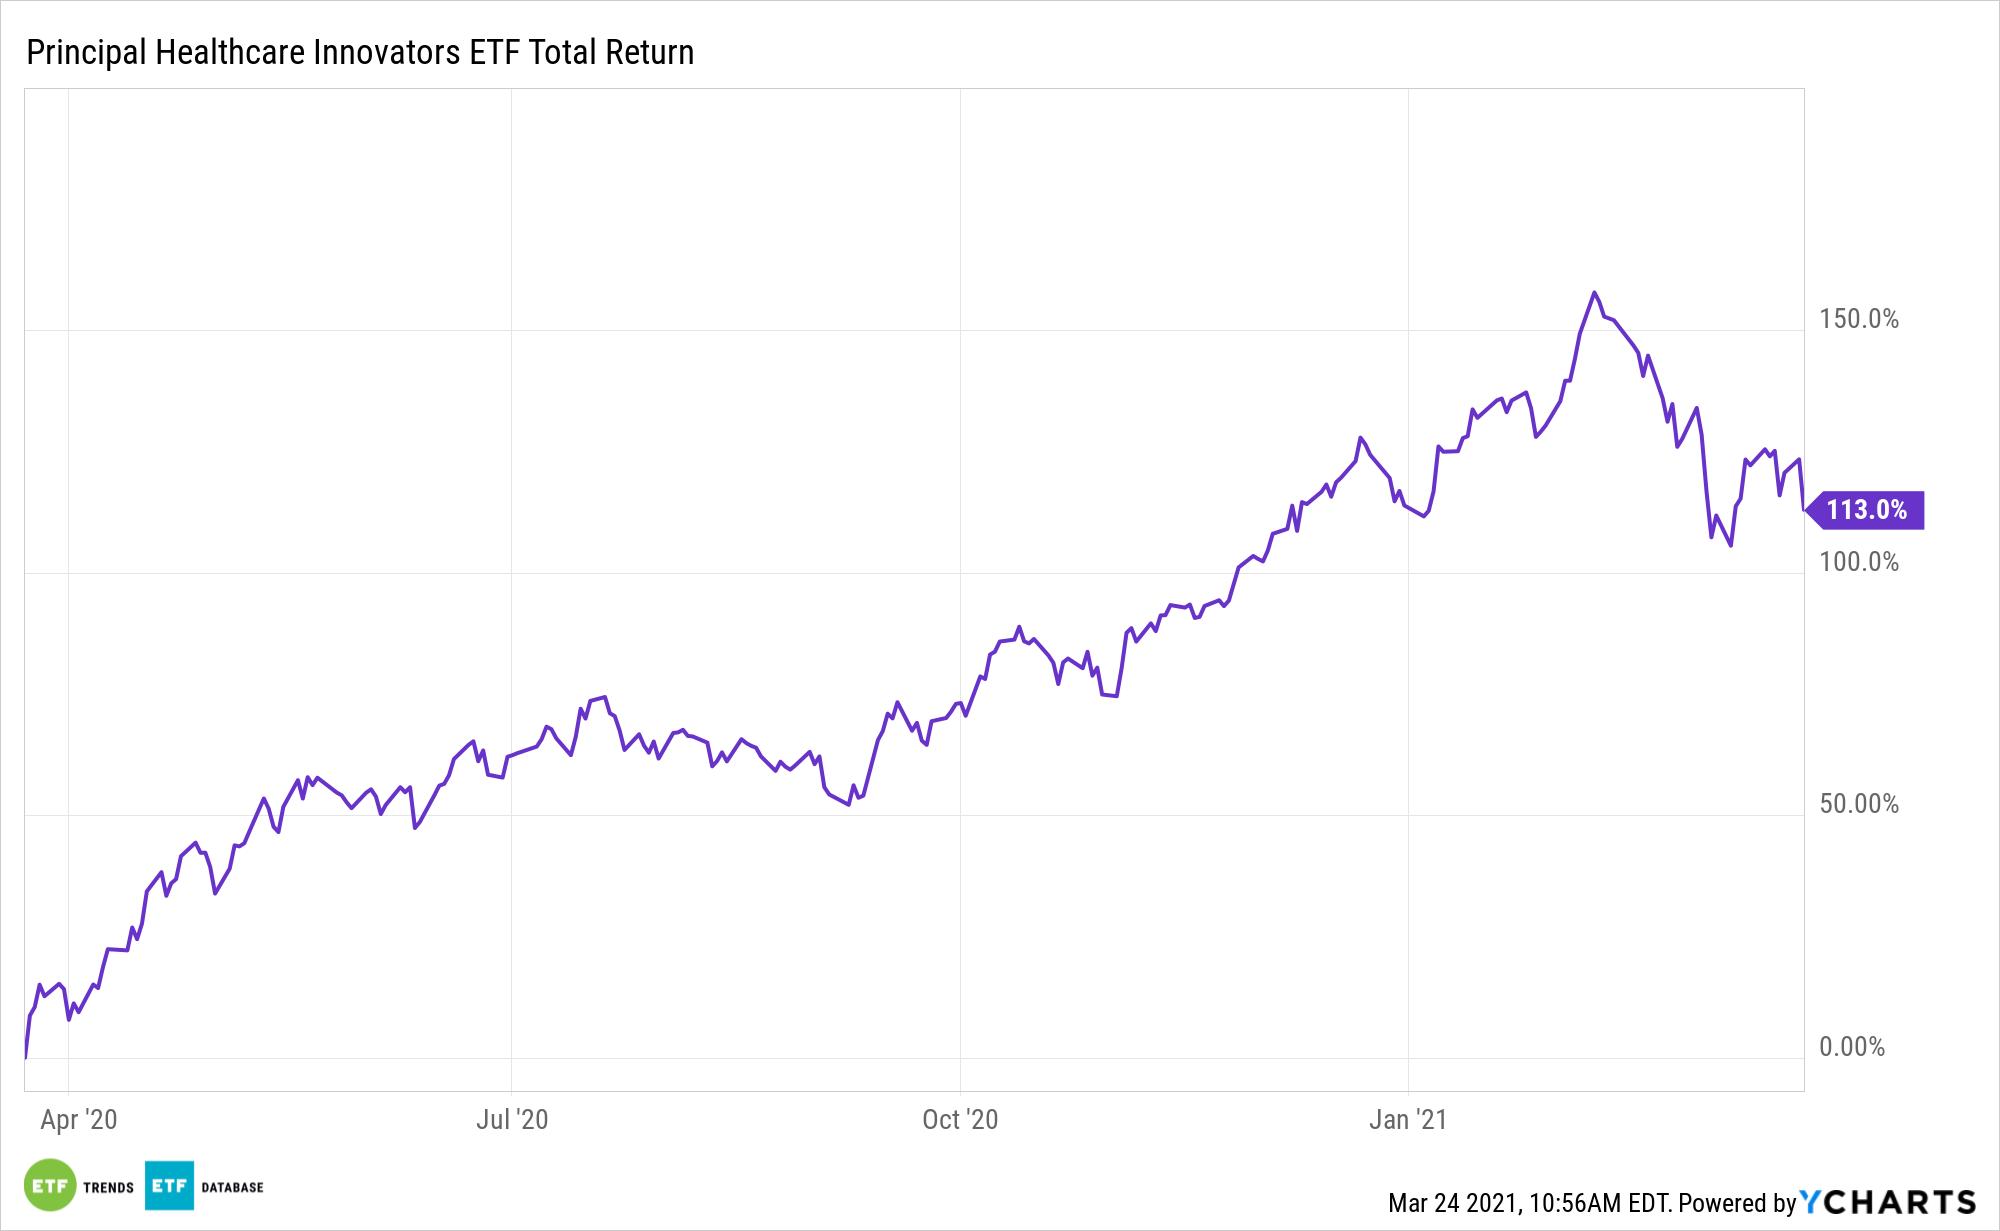 BTEC 1 Year Total Return